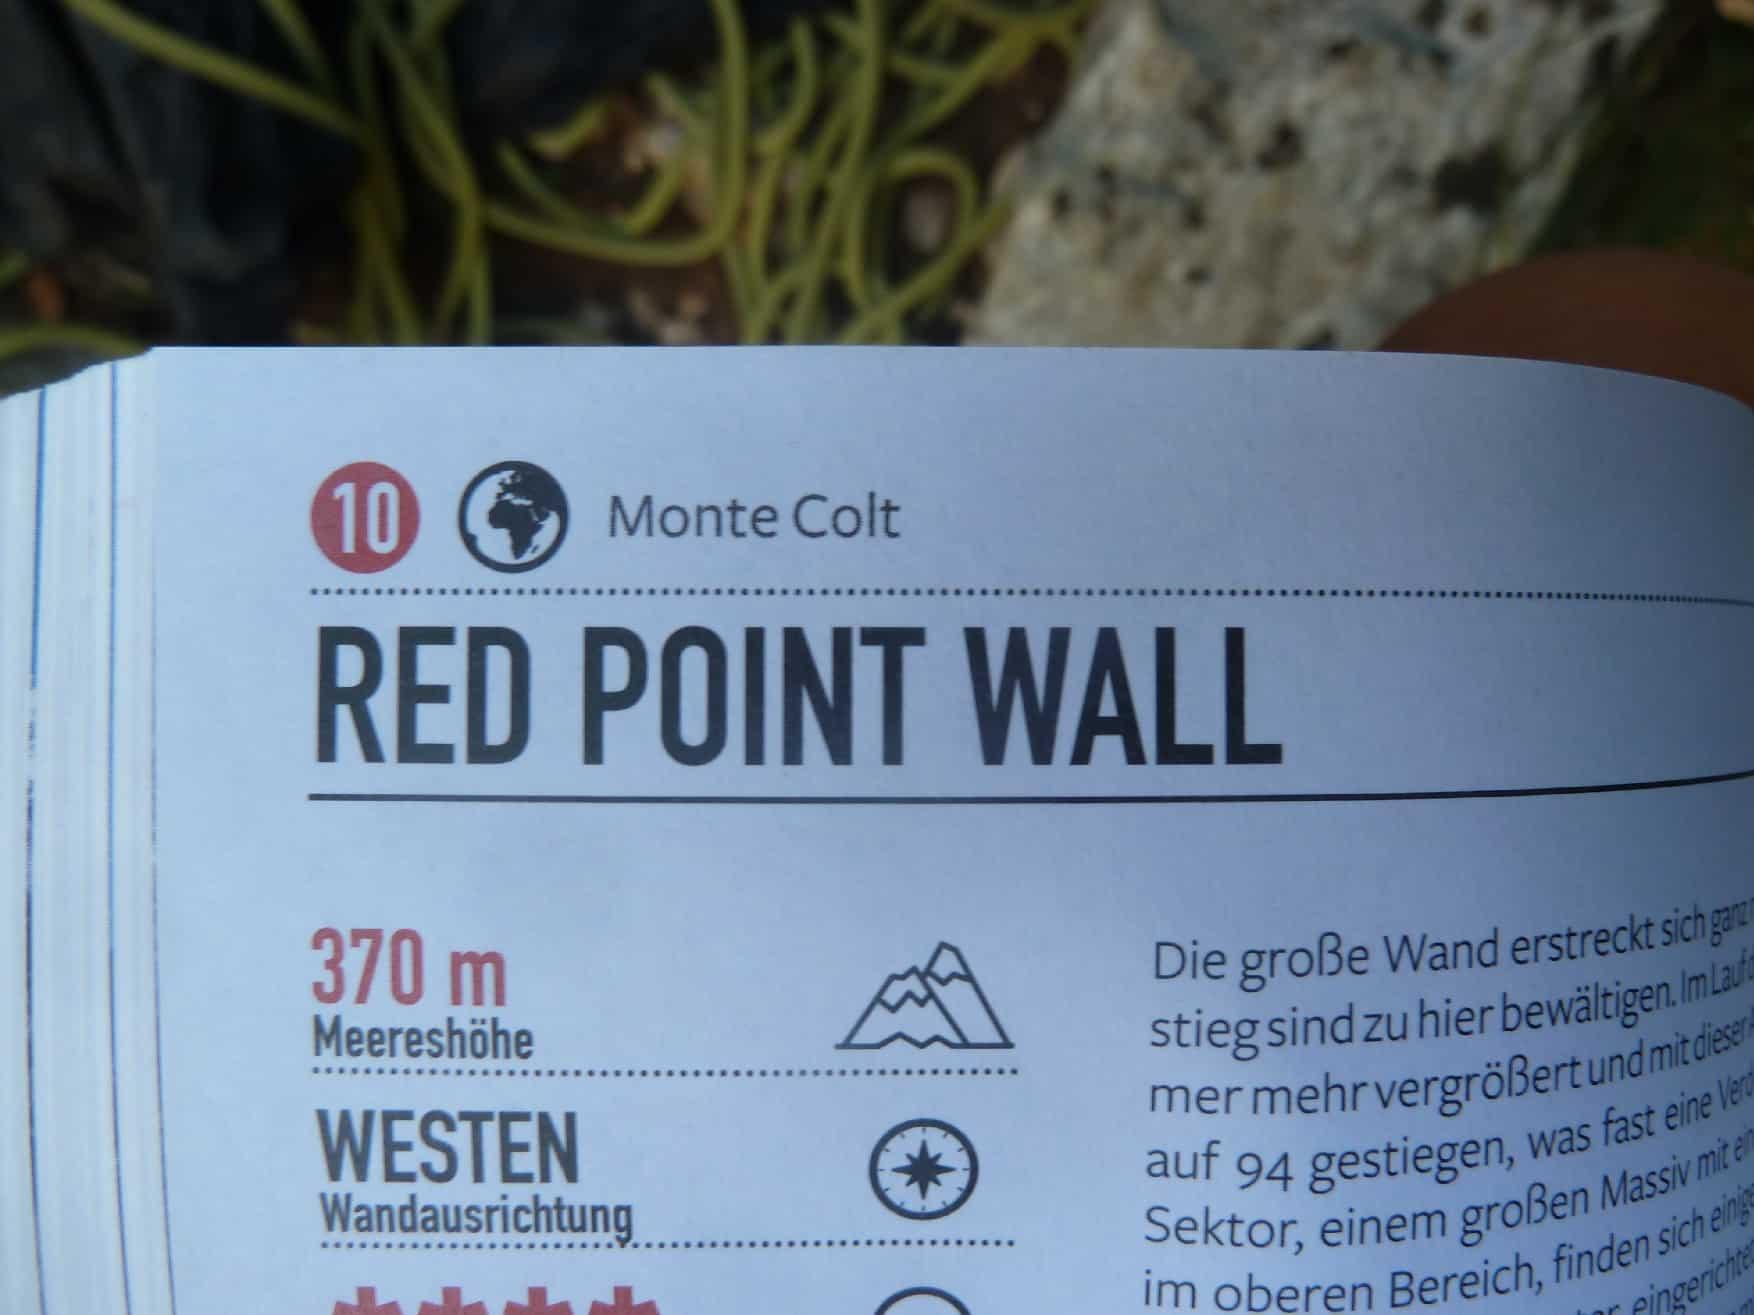 Klettern an der Red Point Wall